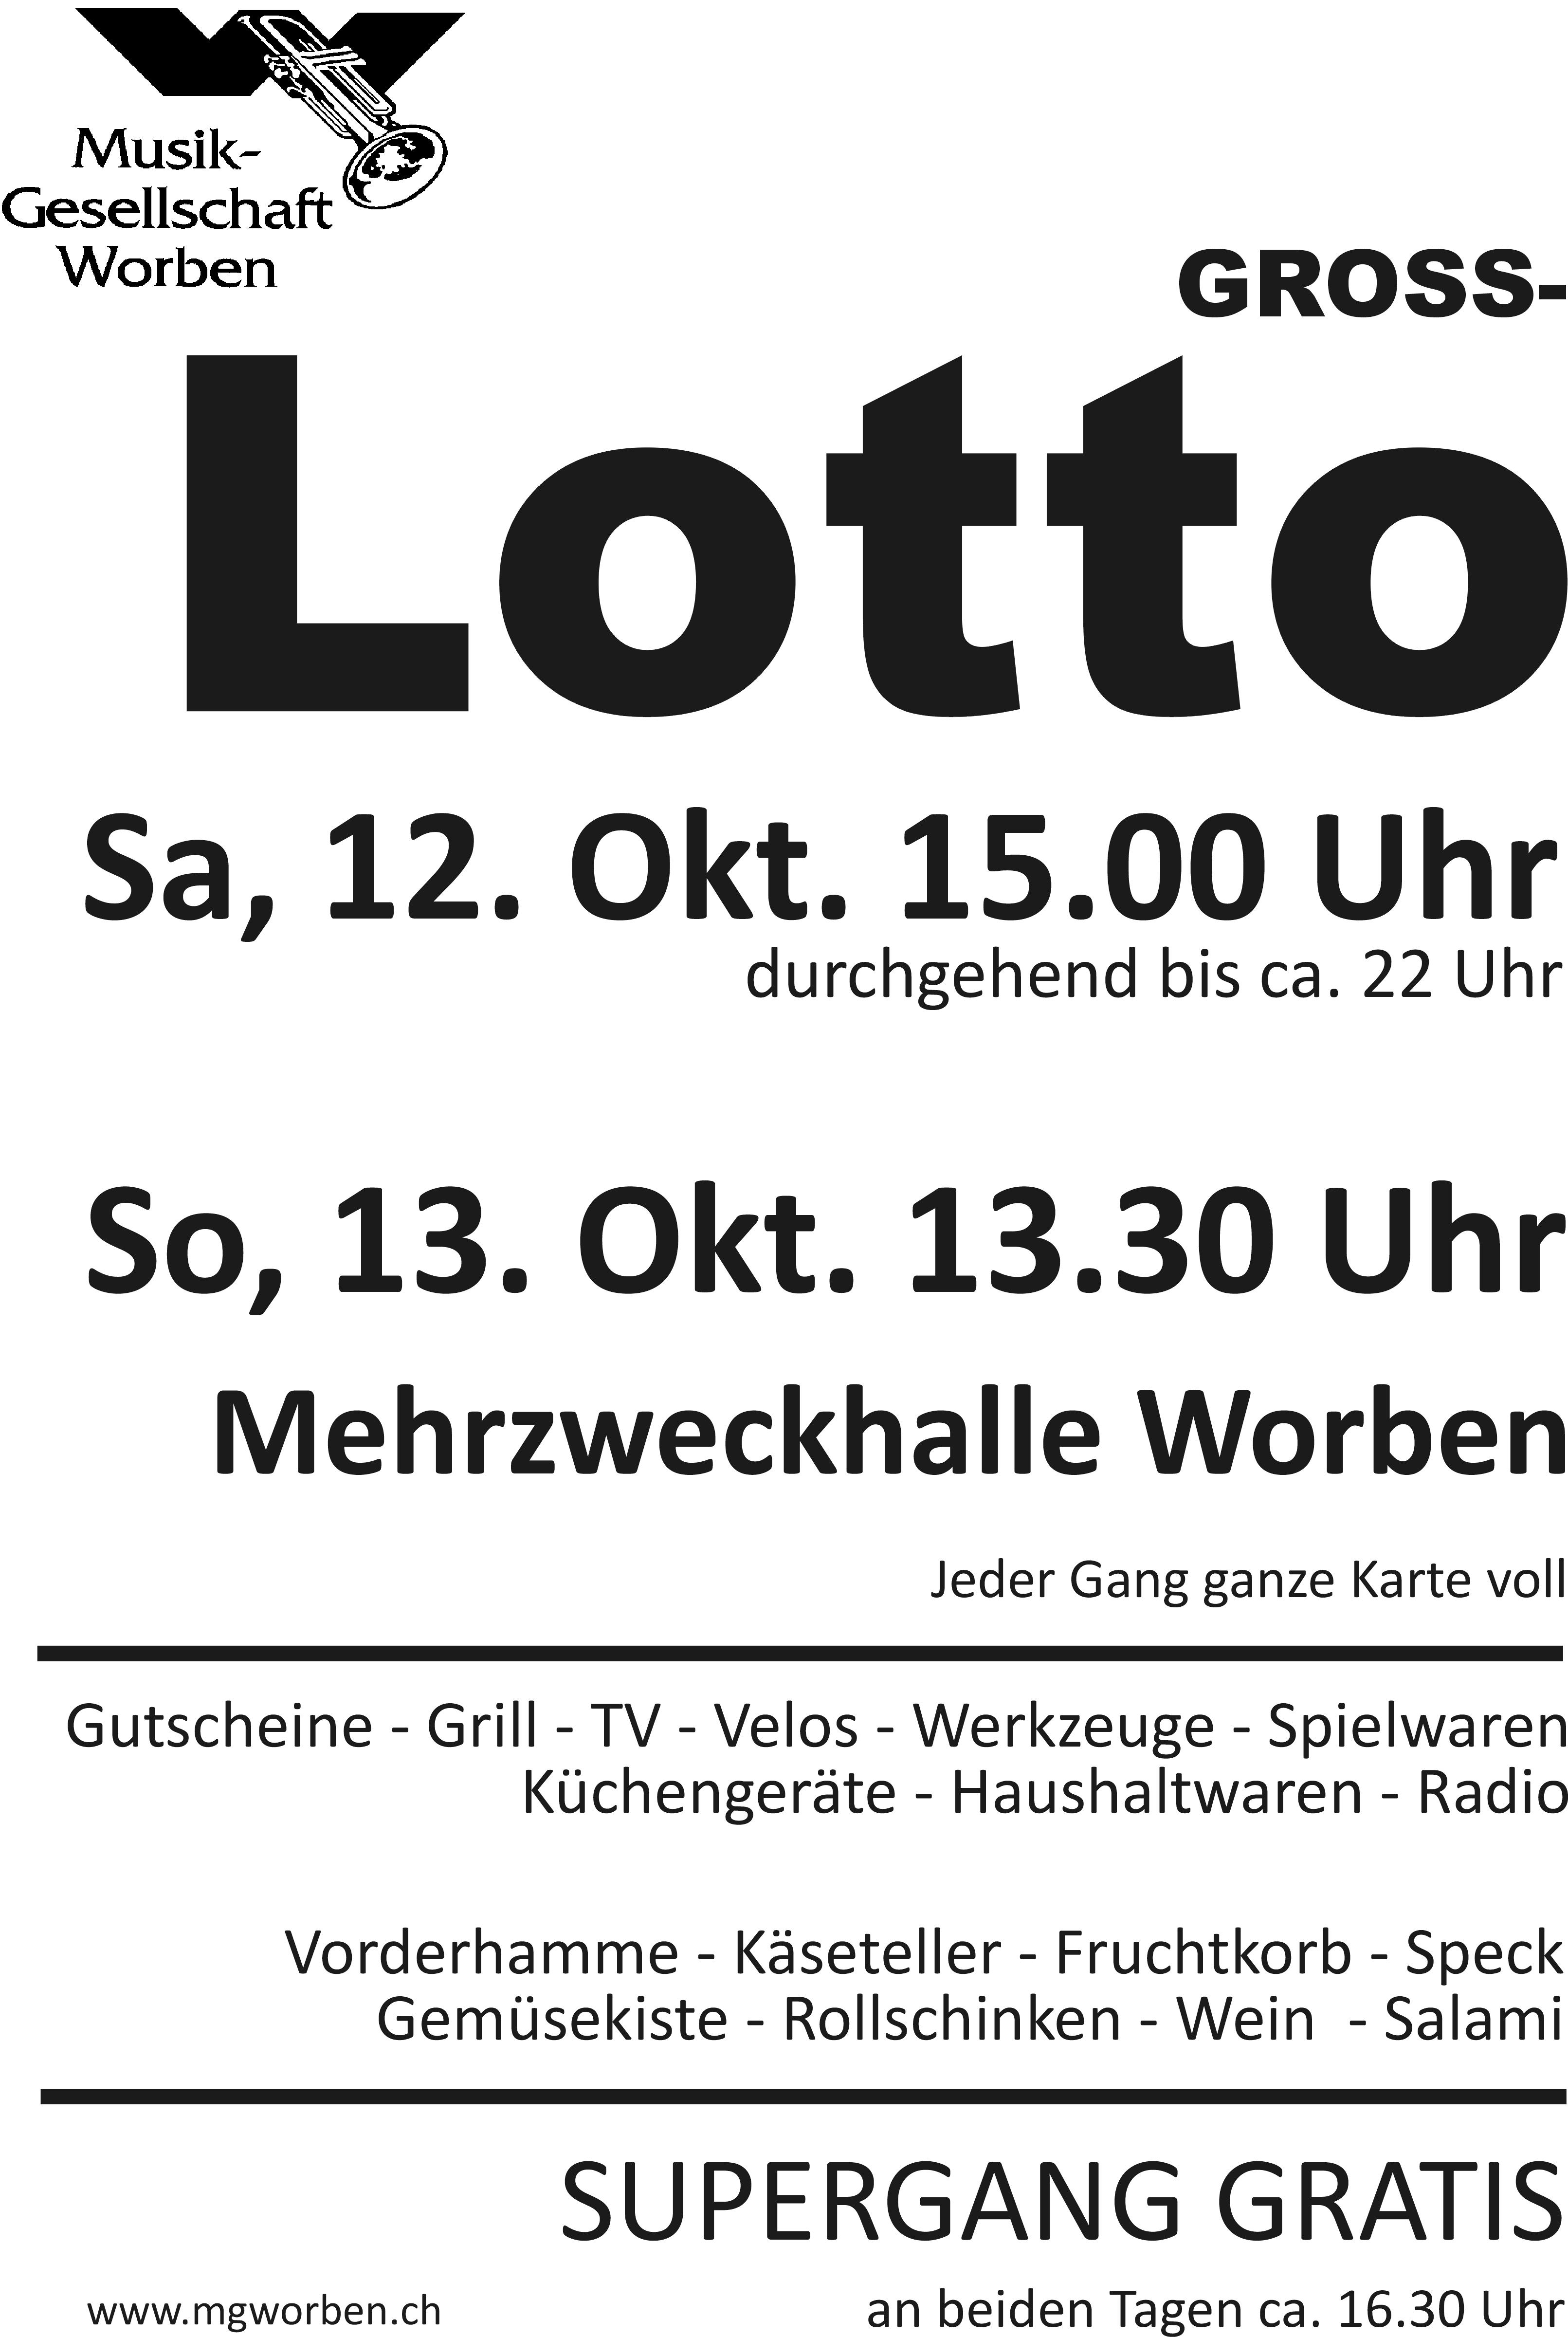 Gross-Lotto @ MZH, Worben